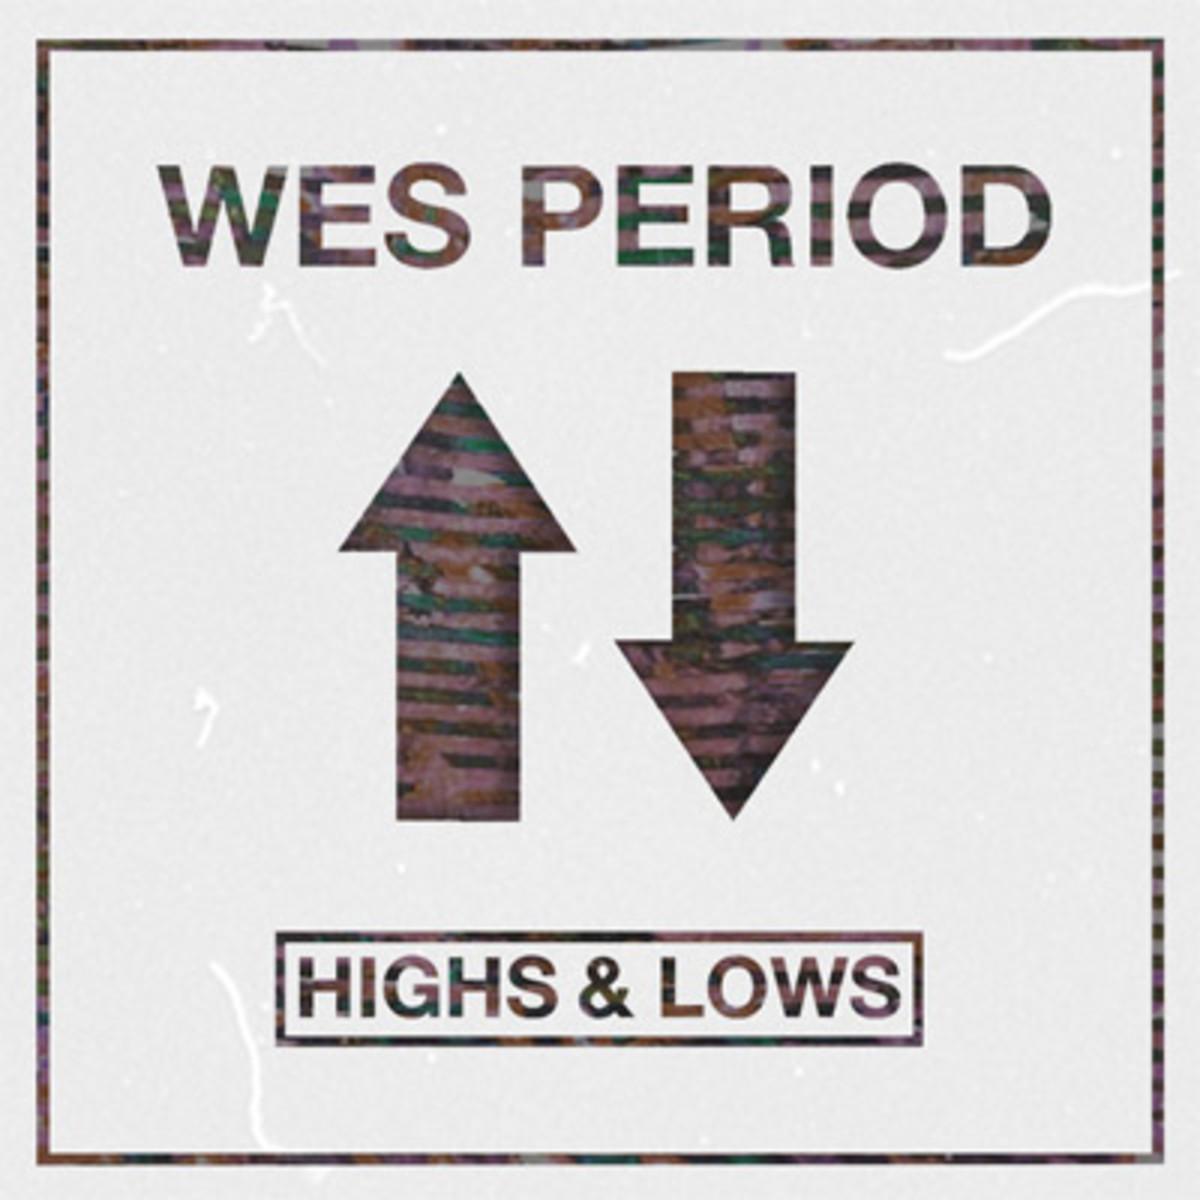 wesperiod-highslows.jpg